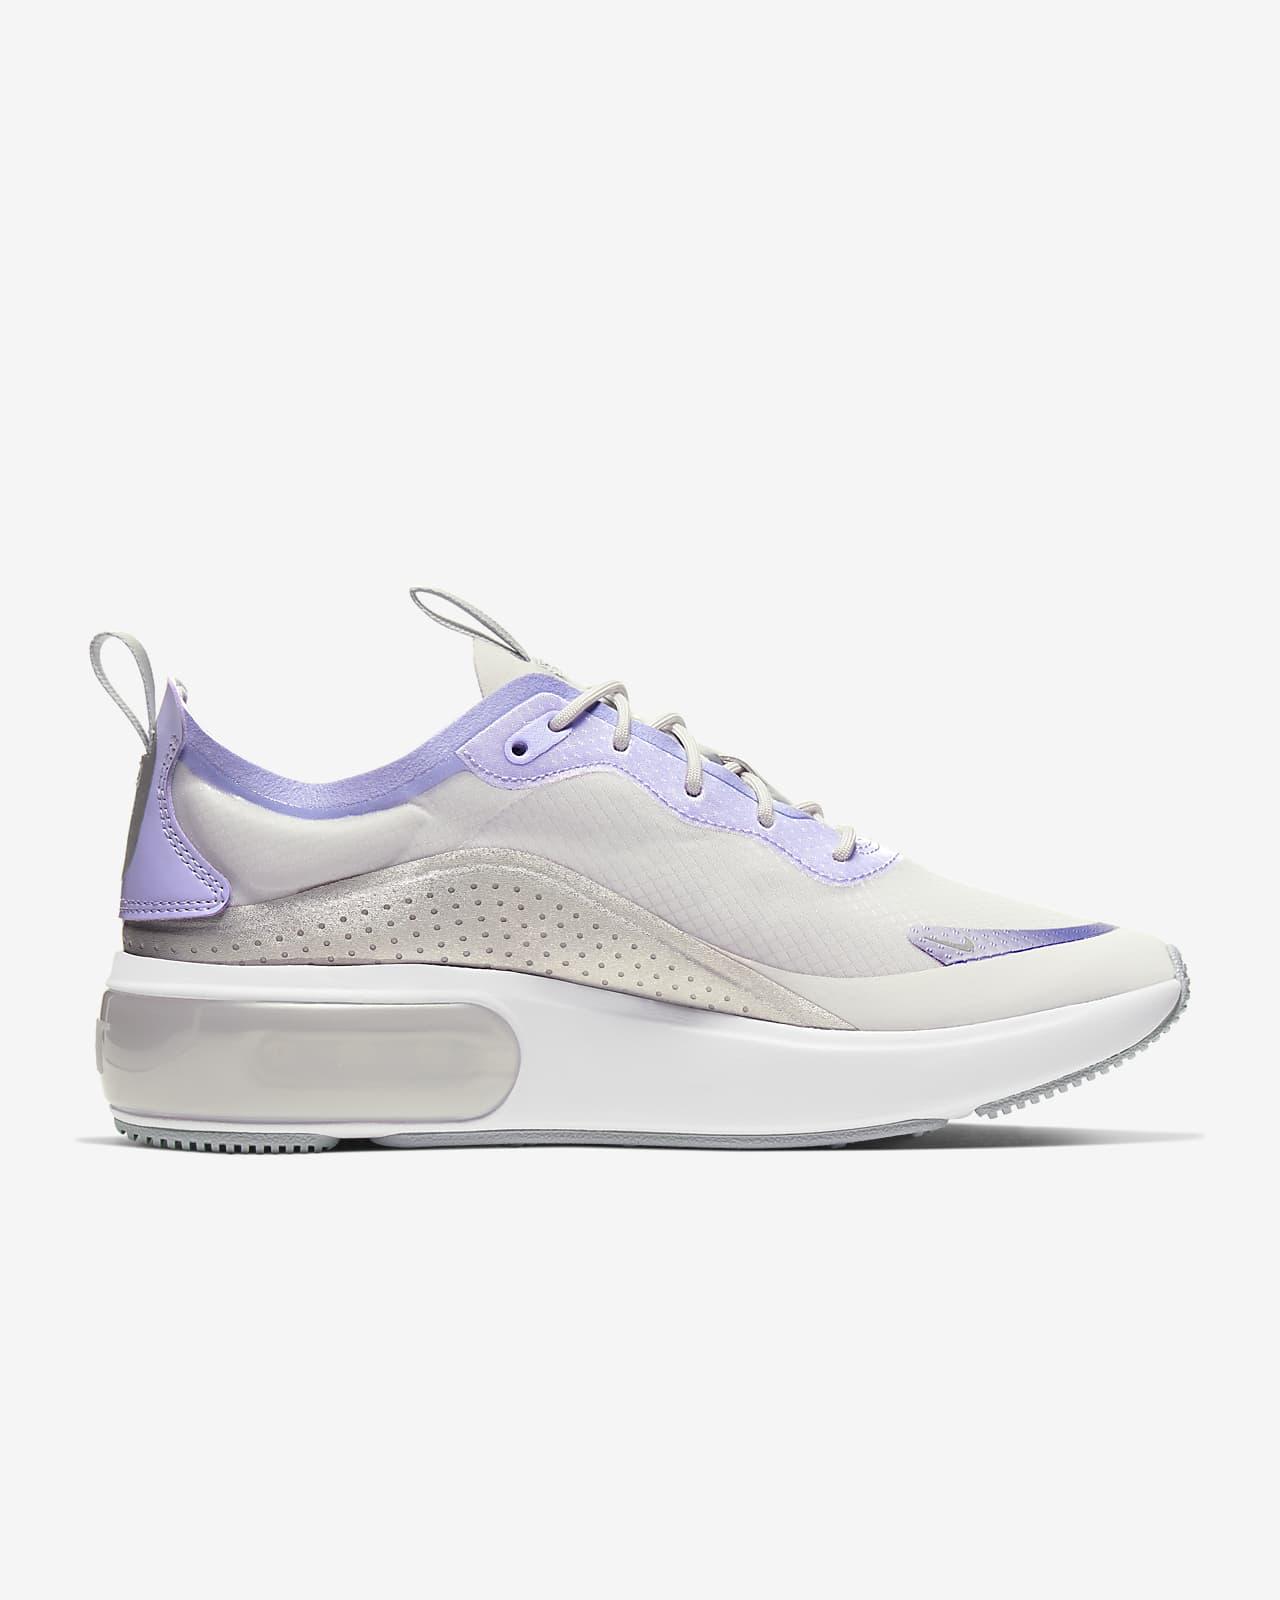 Nike Air Max Dia SE Women's Shoe. Nike CA